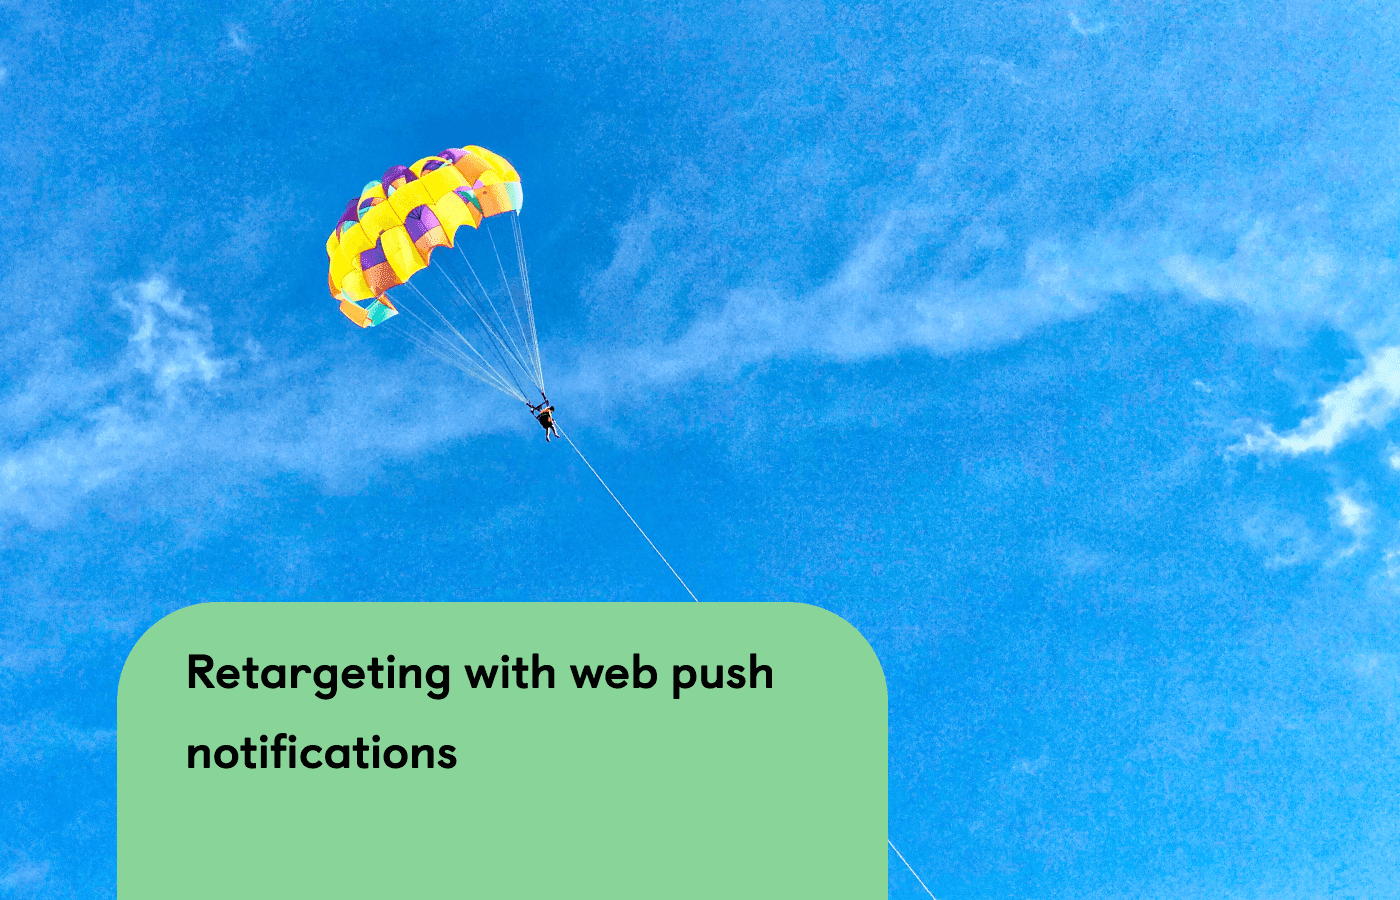 Retargeting with Web Push Notifications